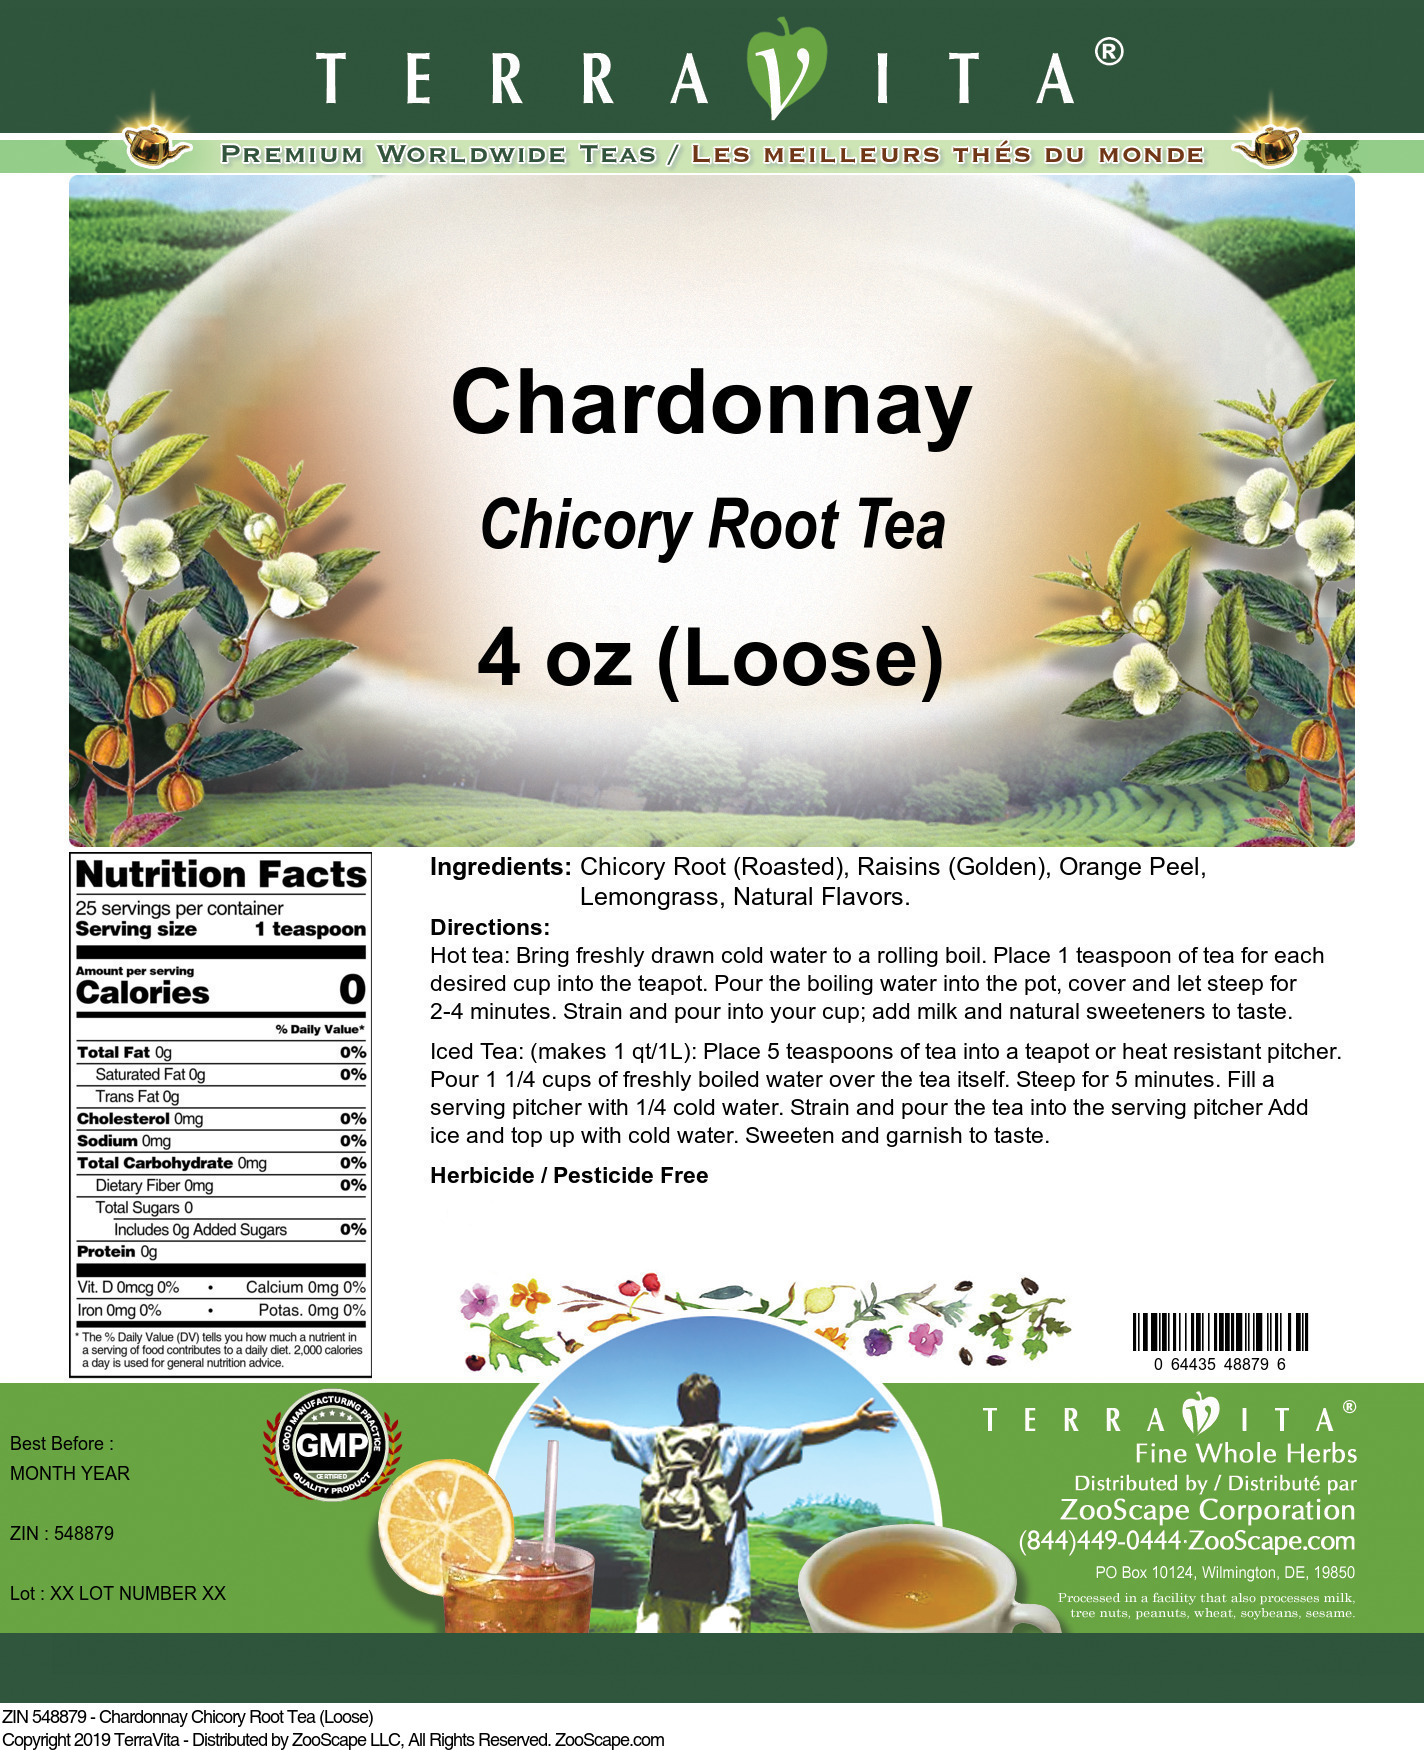 Chardonnay Chicory Root Tea (Loose)